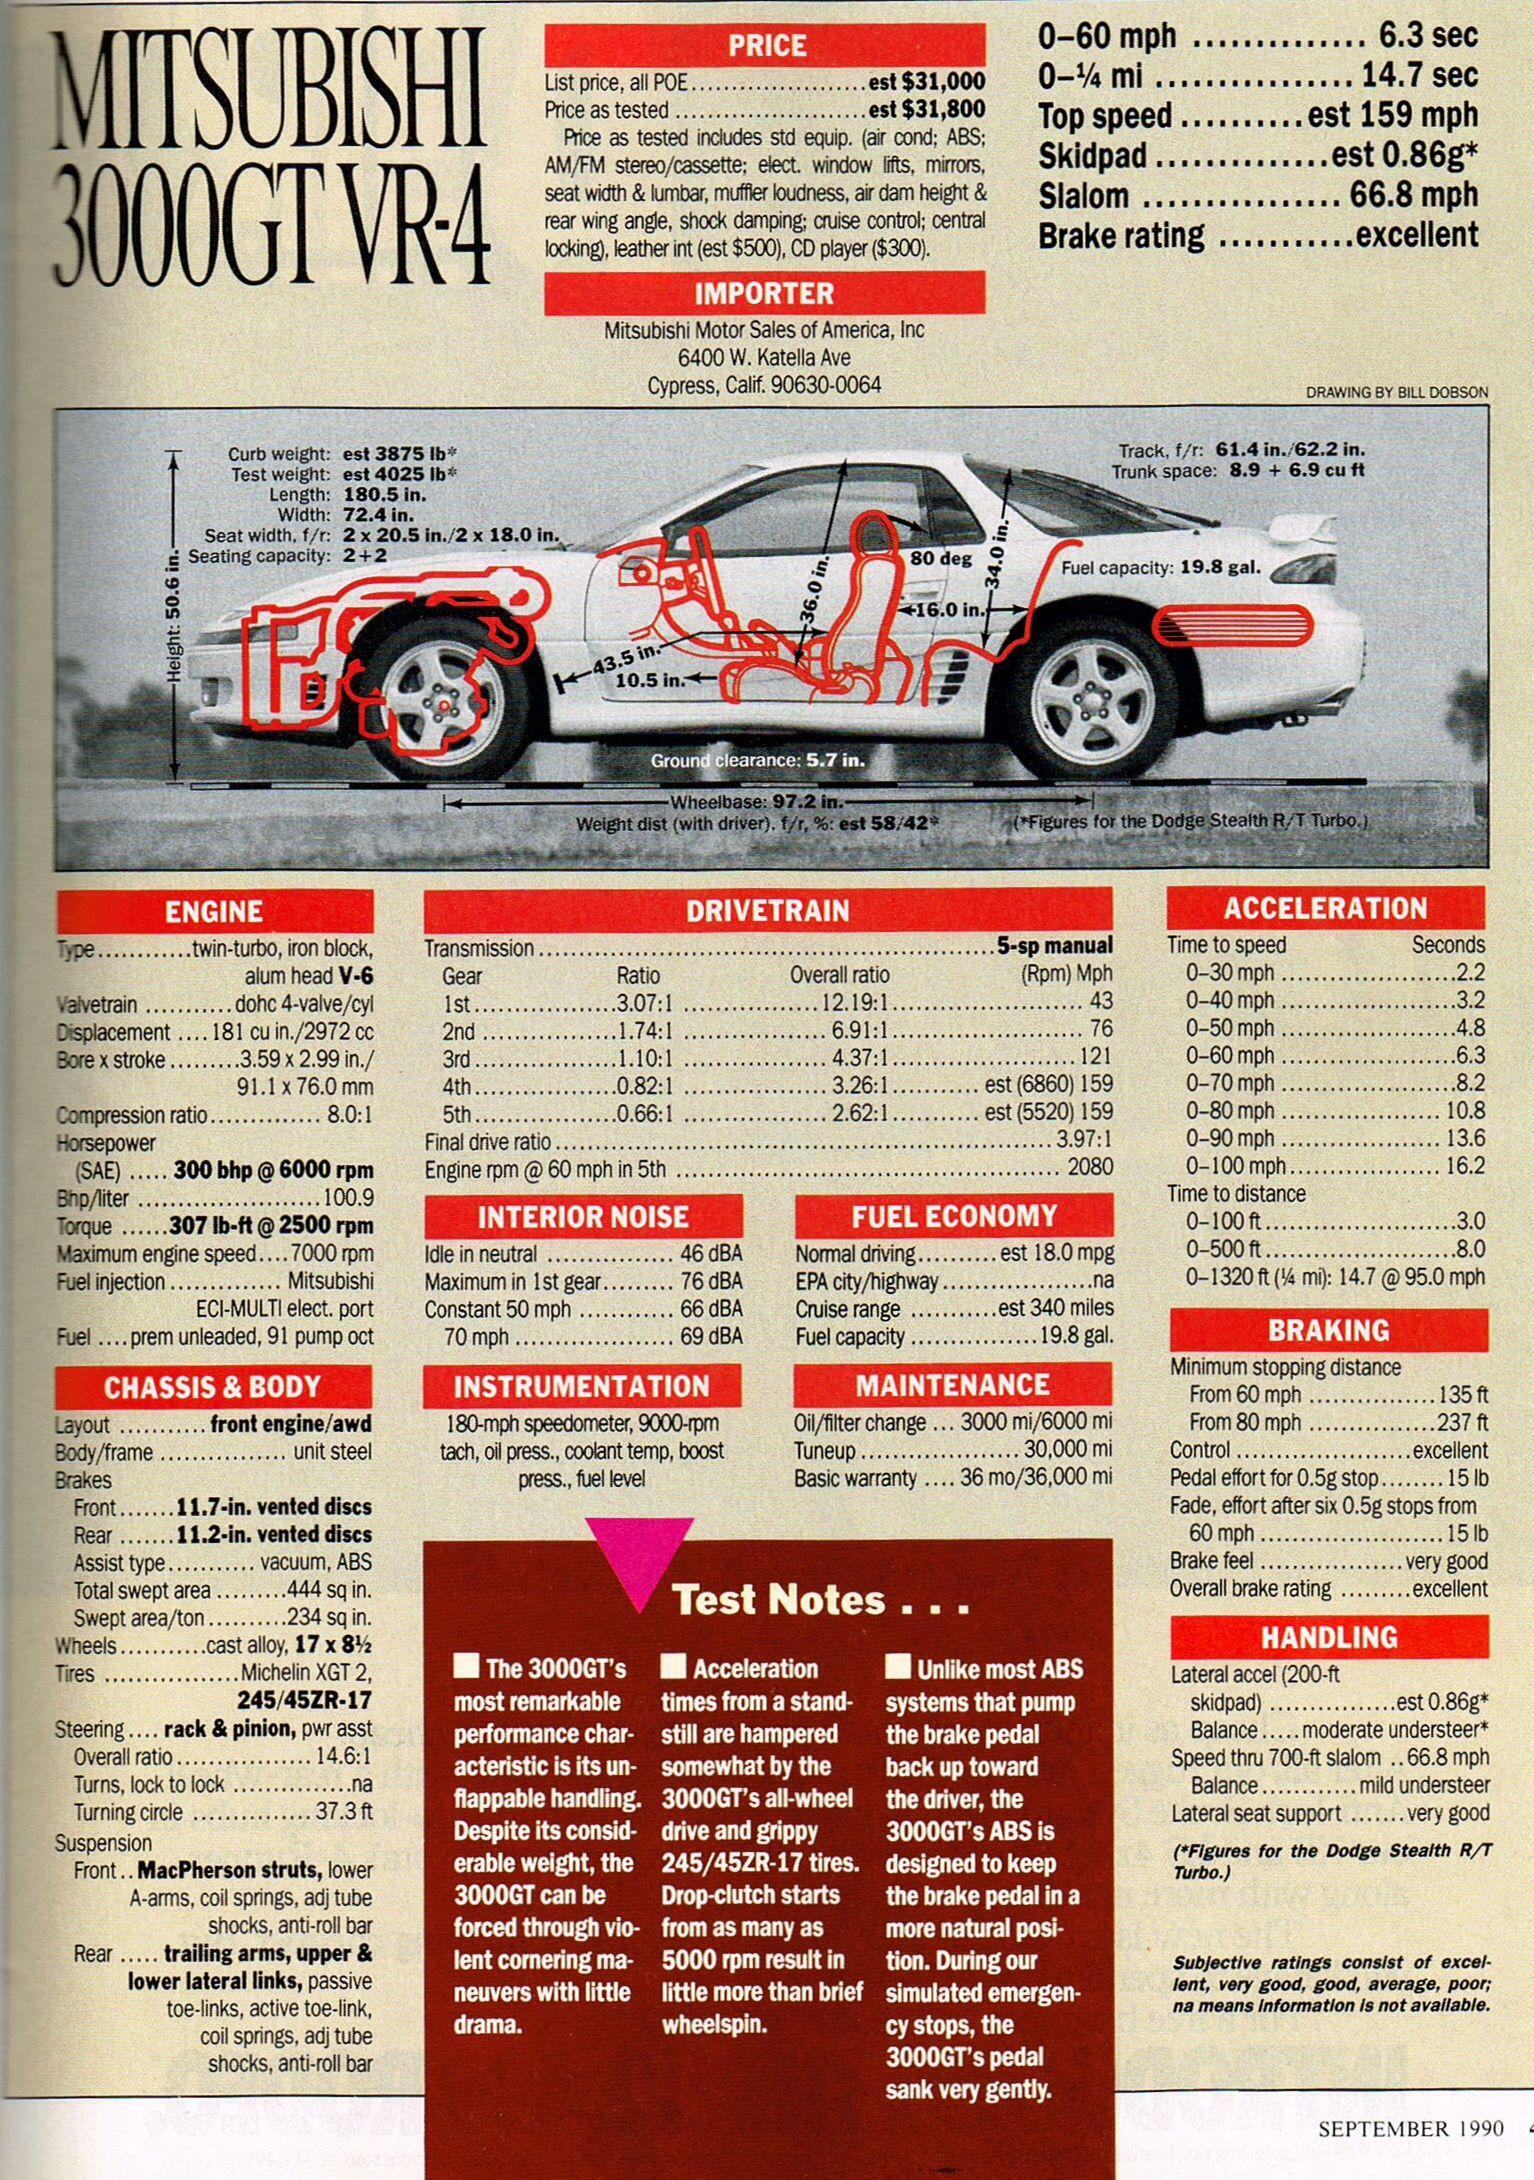 Mitsubishi 3 0 Engine Diagram 3000gt 1991 Wiring Library Vr4 Spec Sheet Lgmsportscom Bike